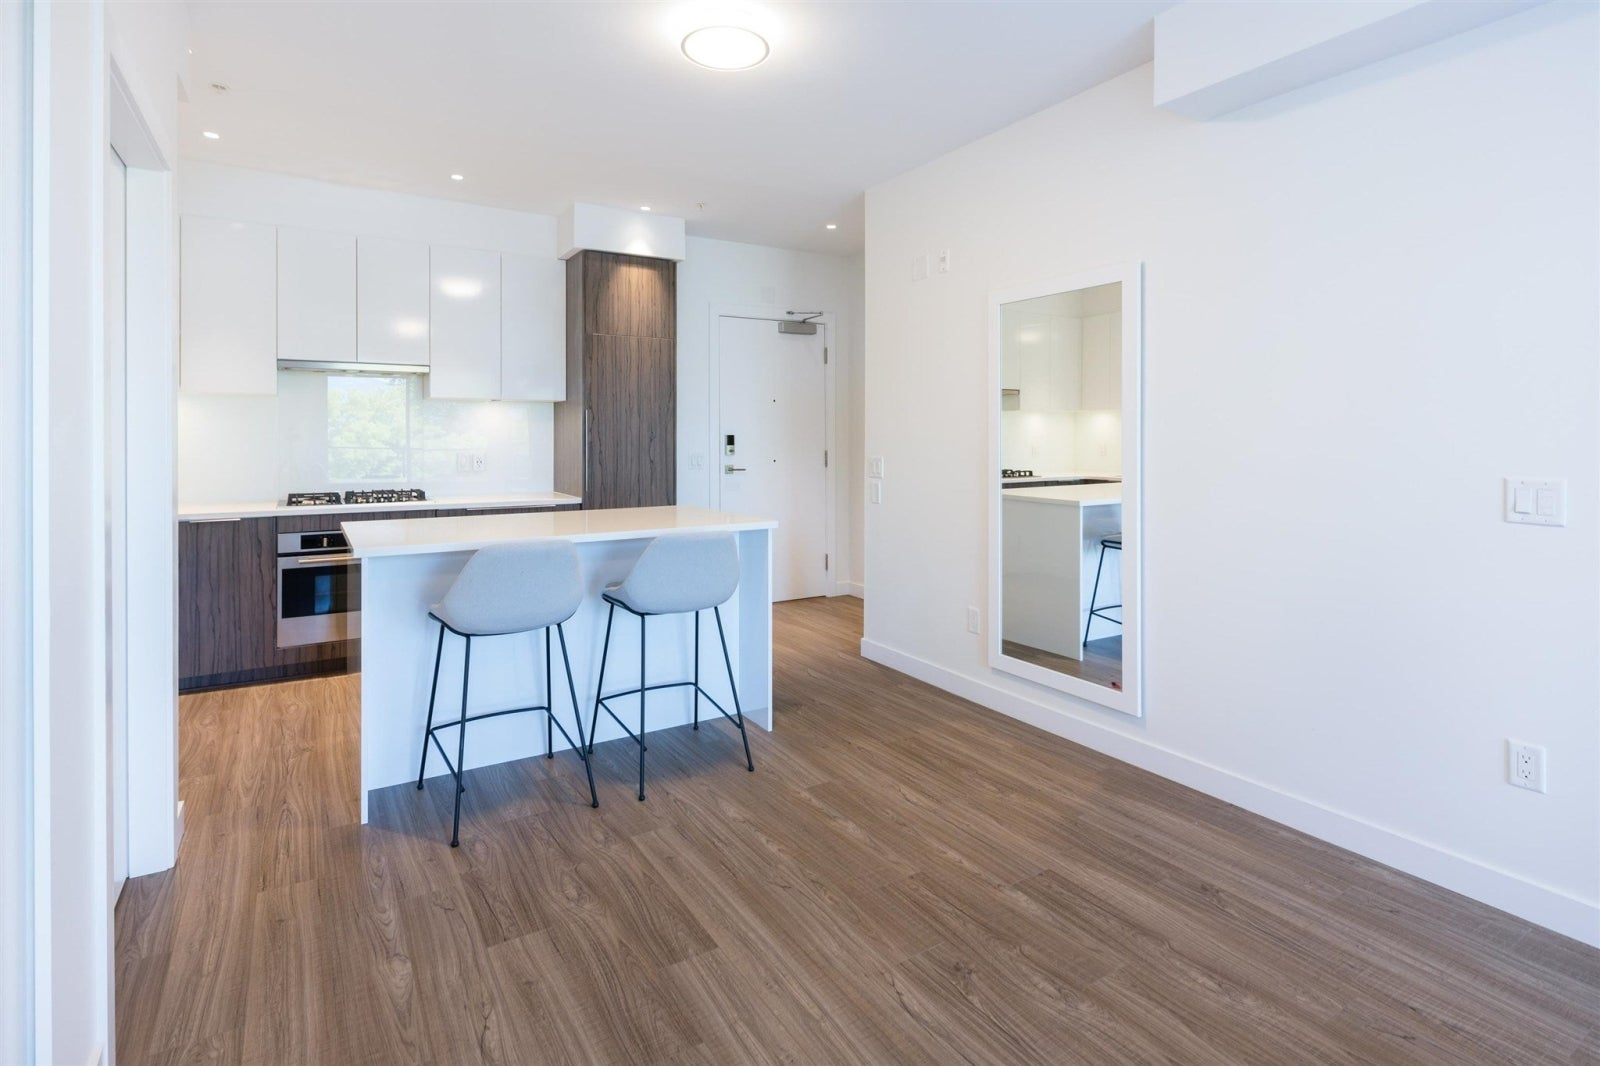 408 379 E BROADWAY AVENUE - Mount Pleasant VE Apartment/Condo for sale, 2 Bedrooms (R2599900) #12